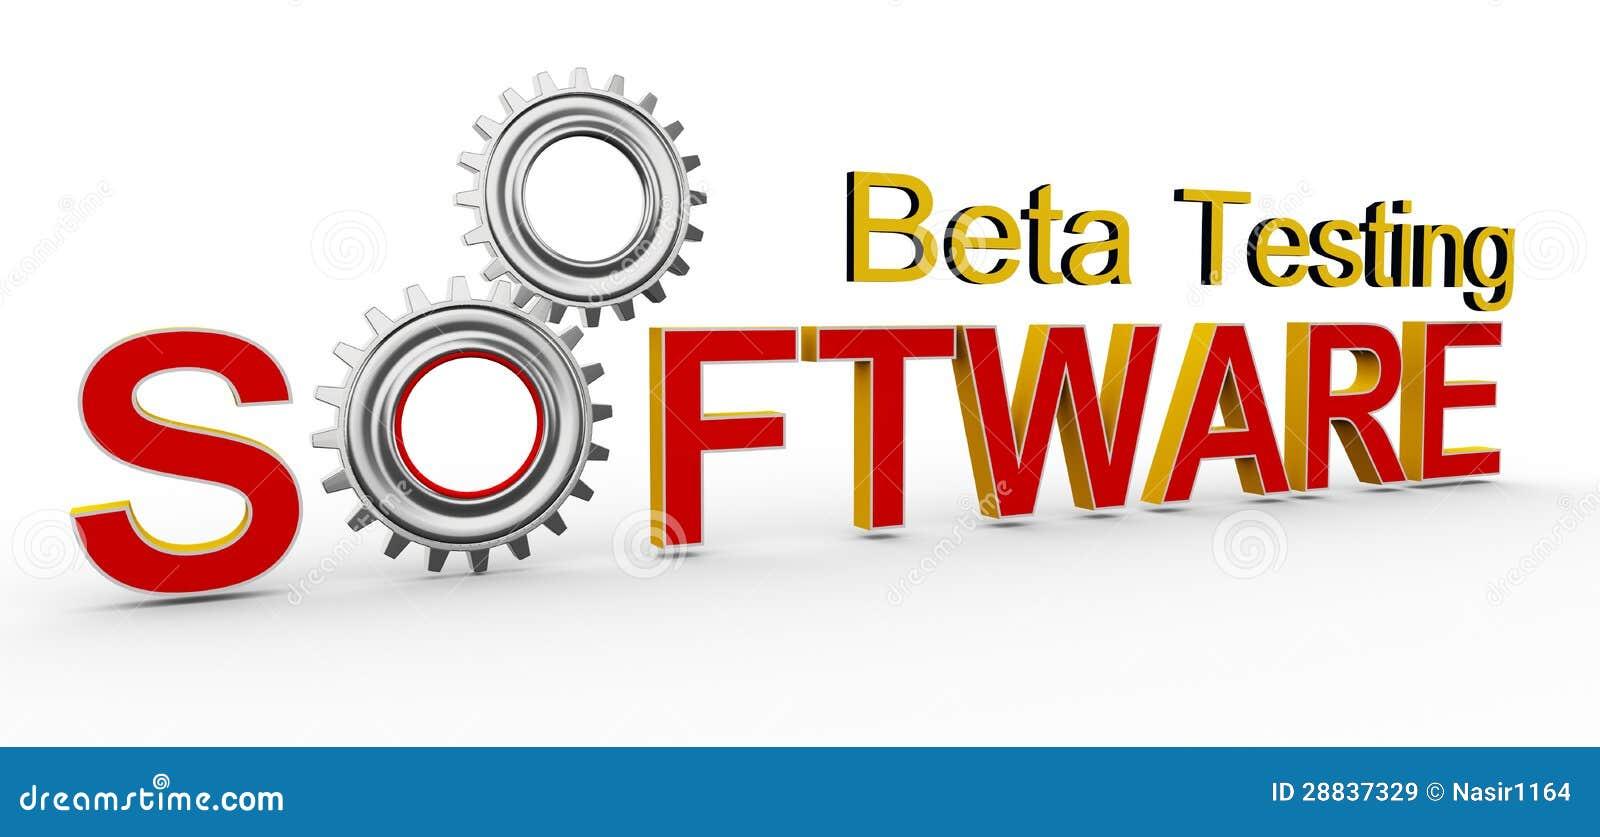 3d software beta testing stock illustration. Image of step ...